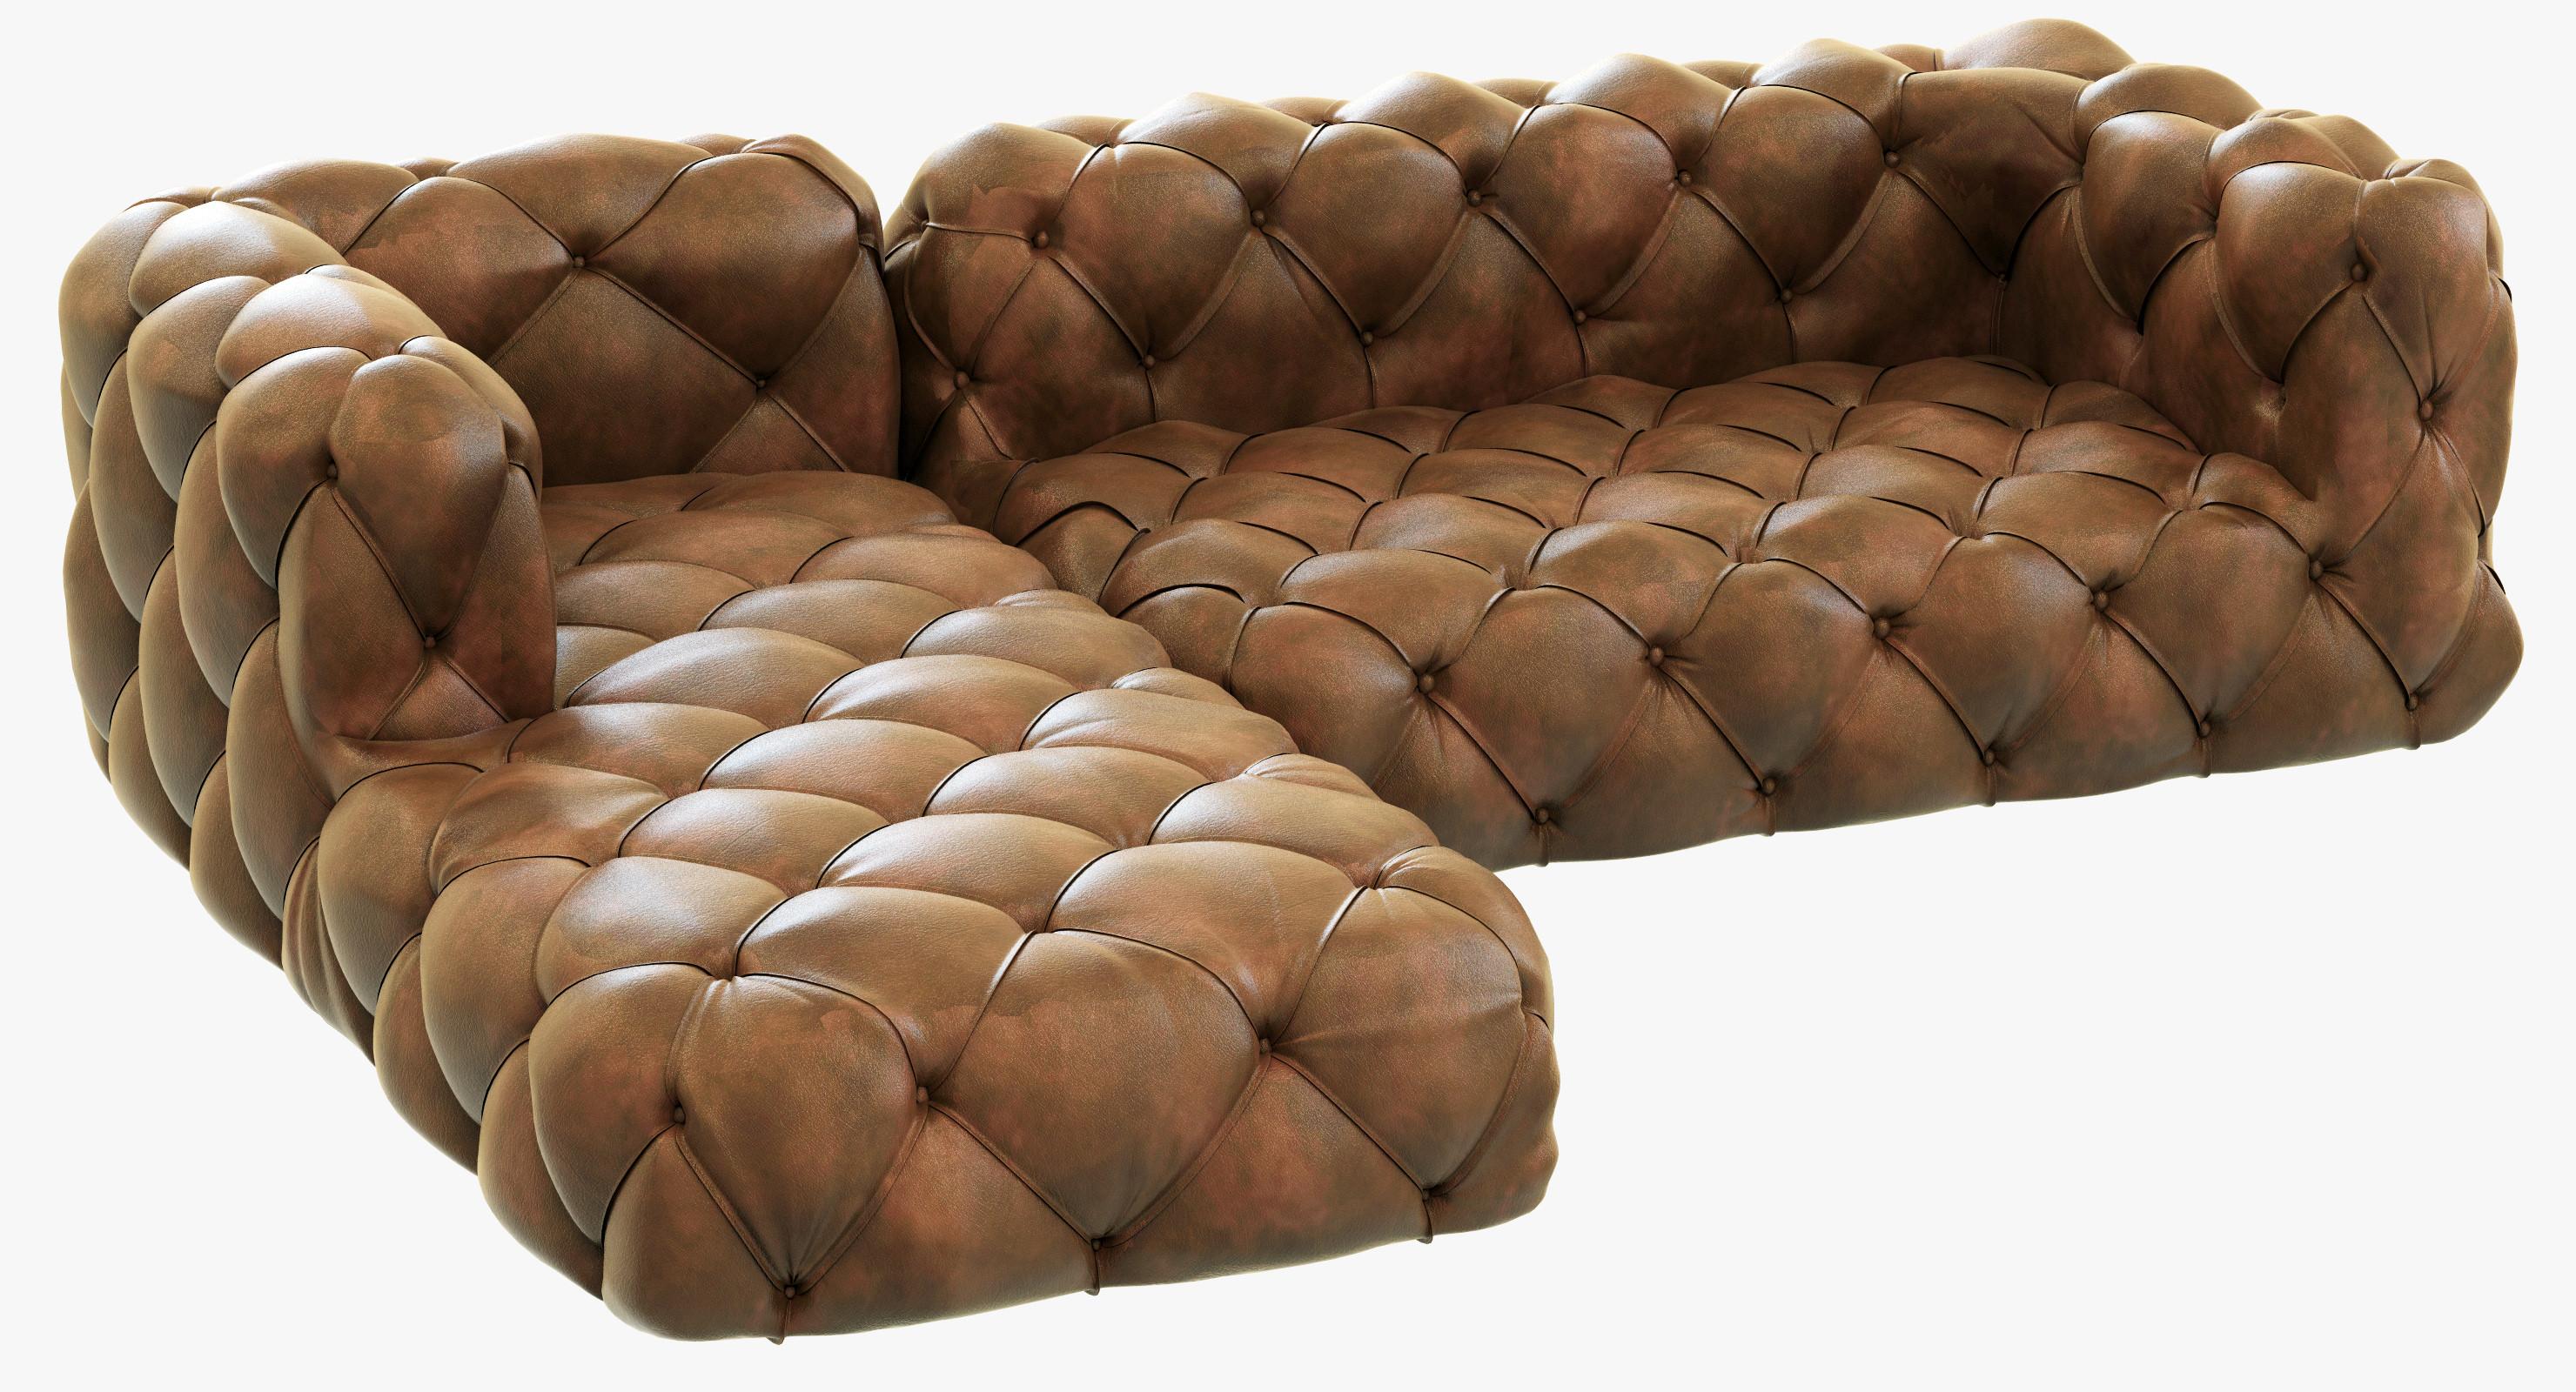 3ds max restoration hardware soho tufted for Restoration hardware tufted sectional sofa